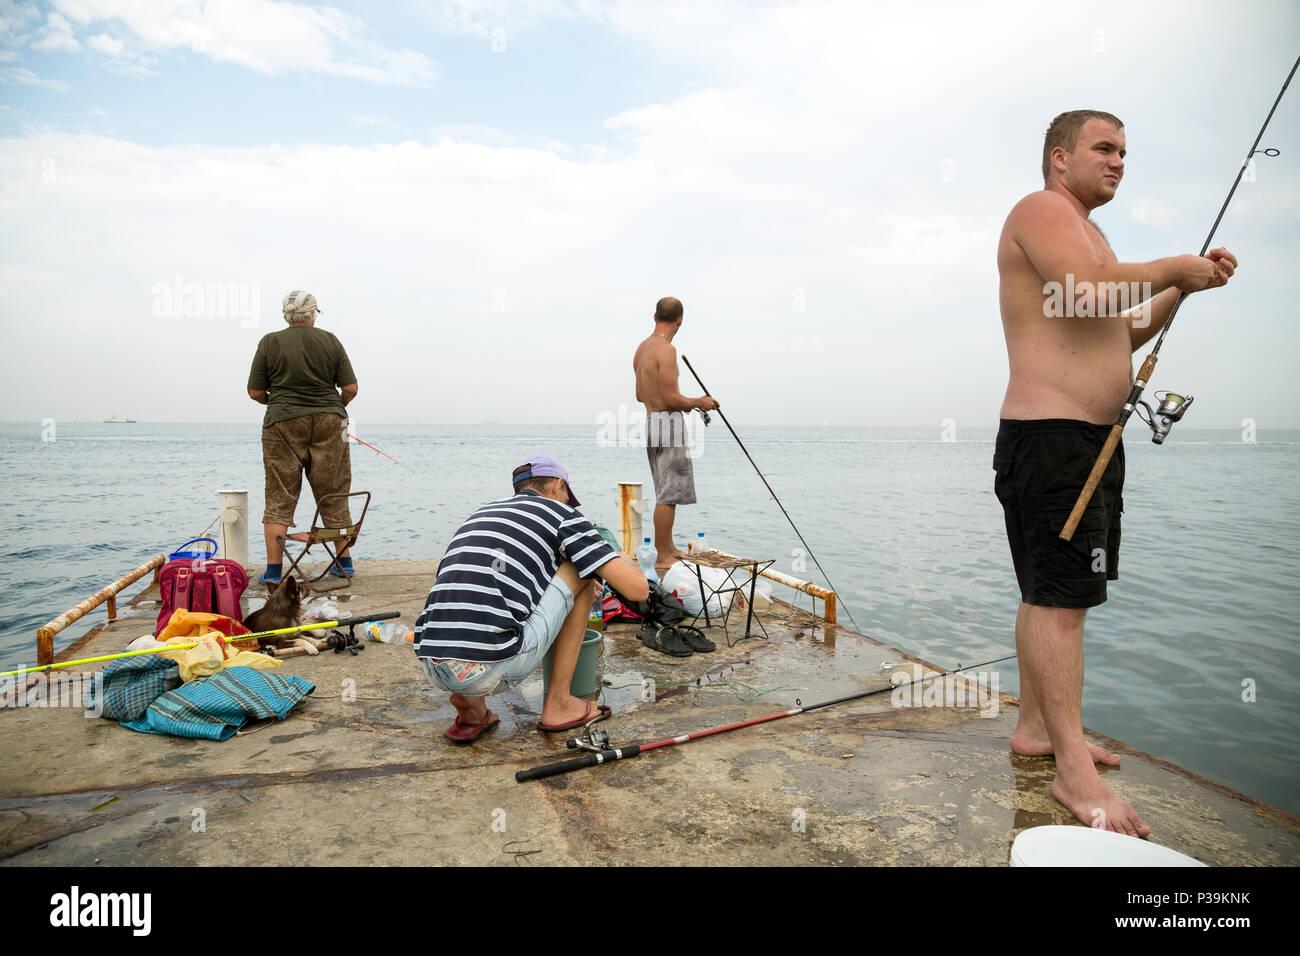 Odessa, Ukraine, anglers on a pier on the Black Sea - Stock Image